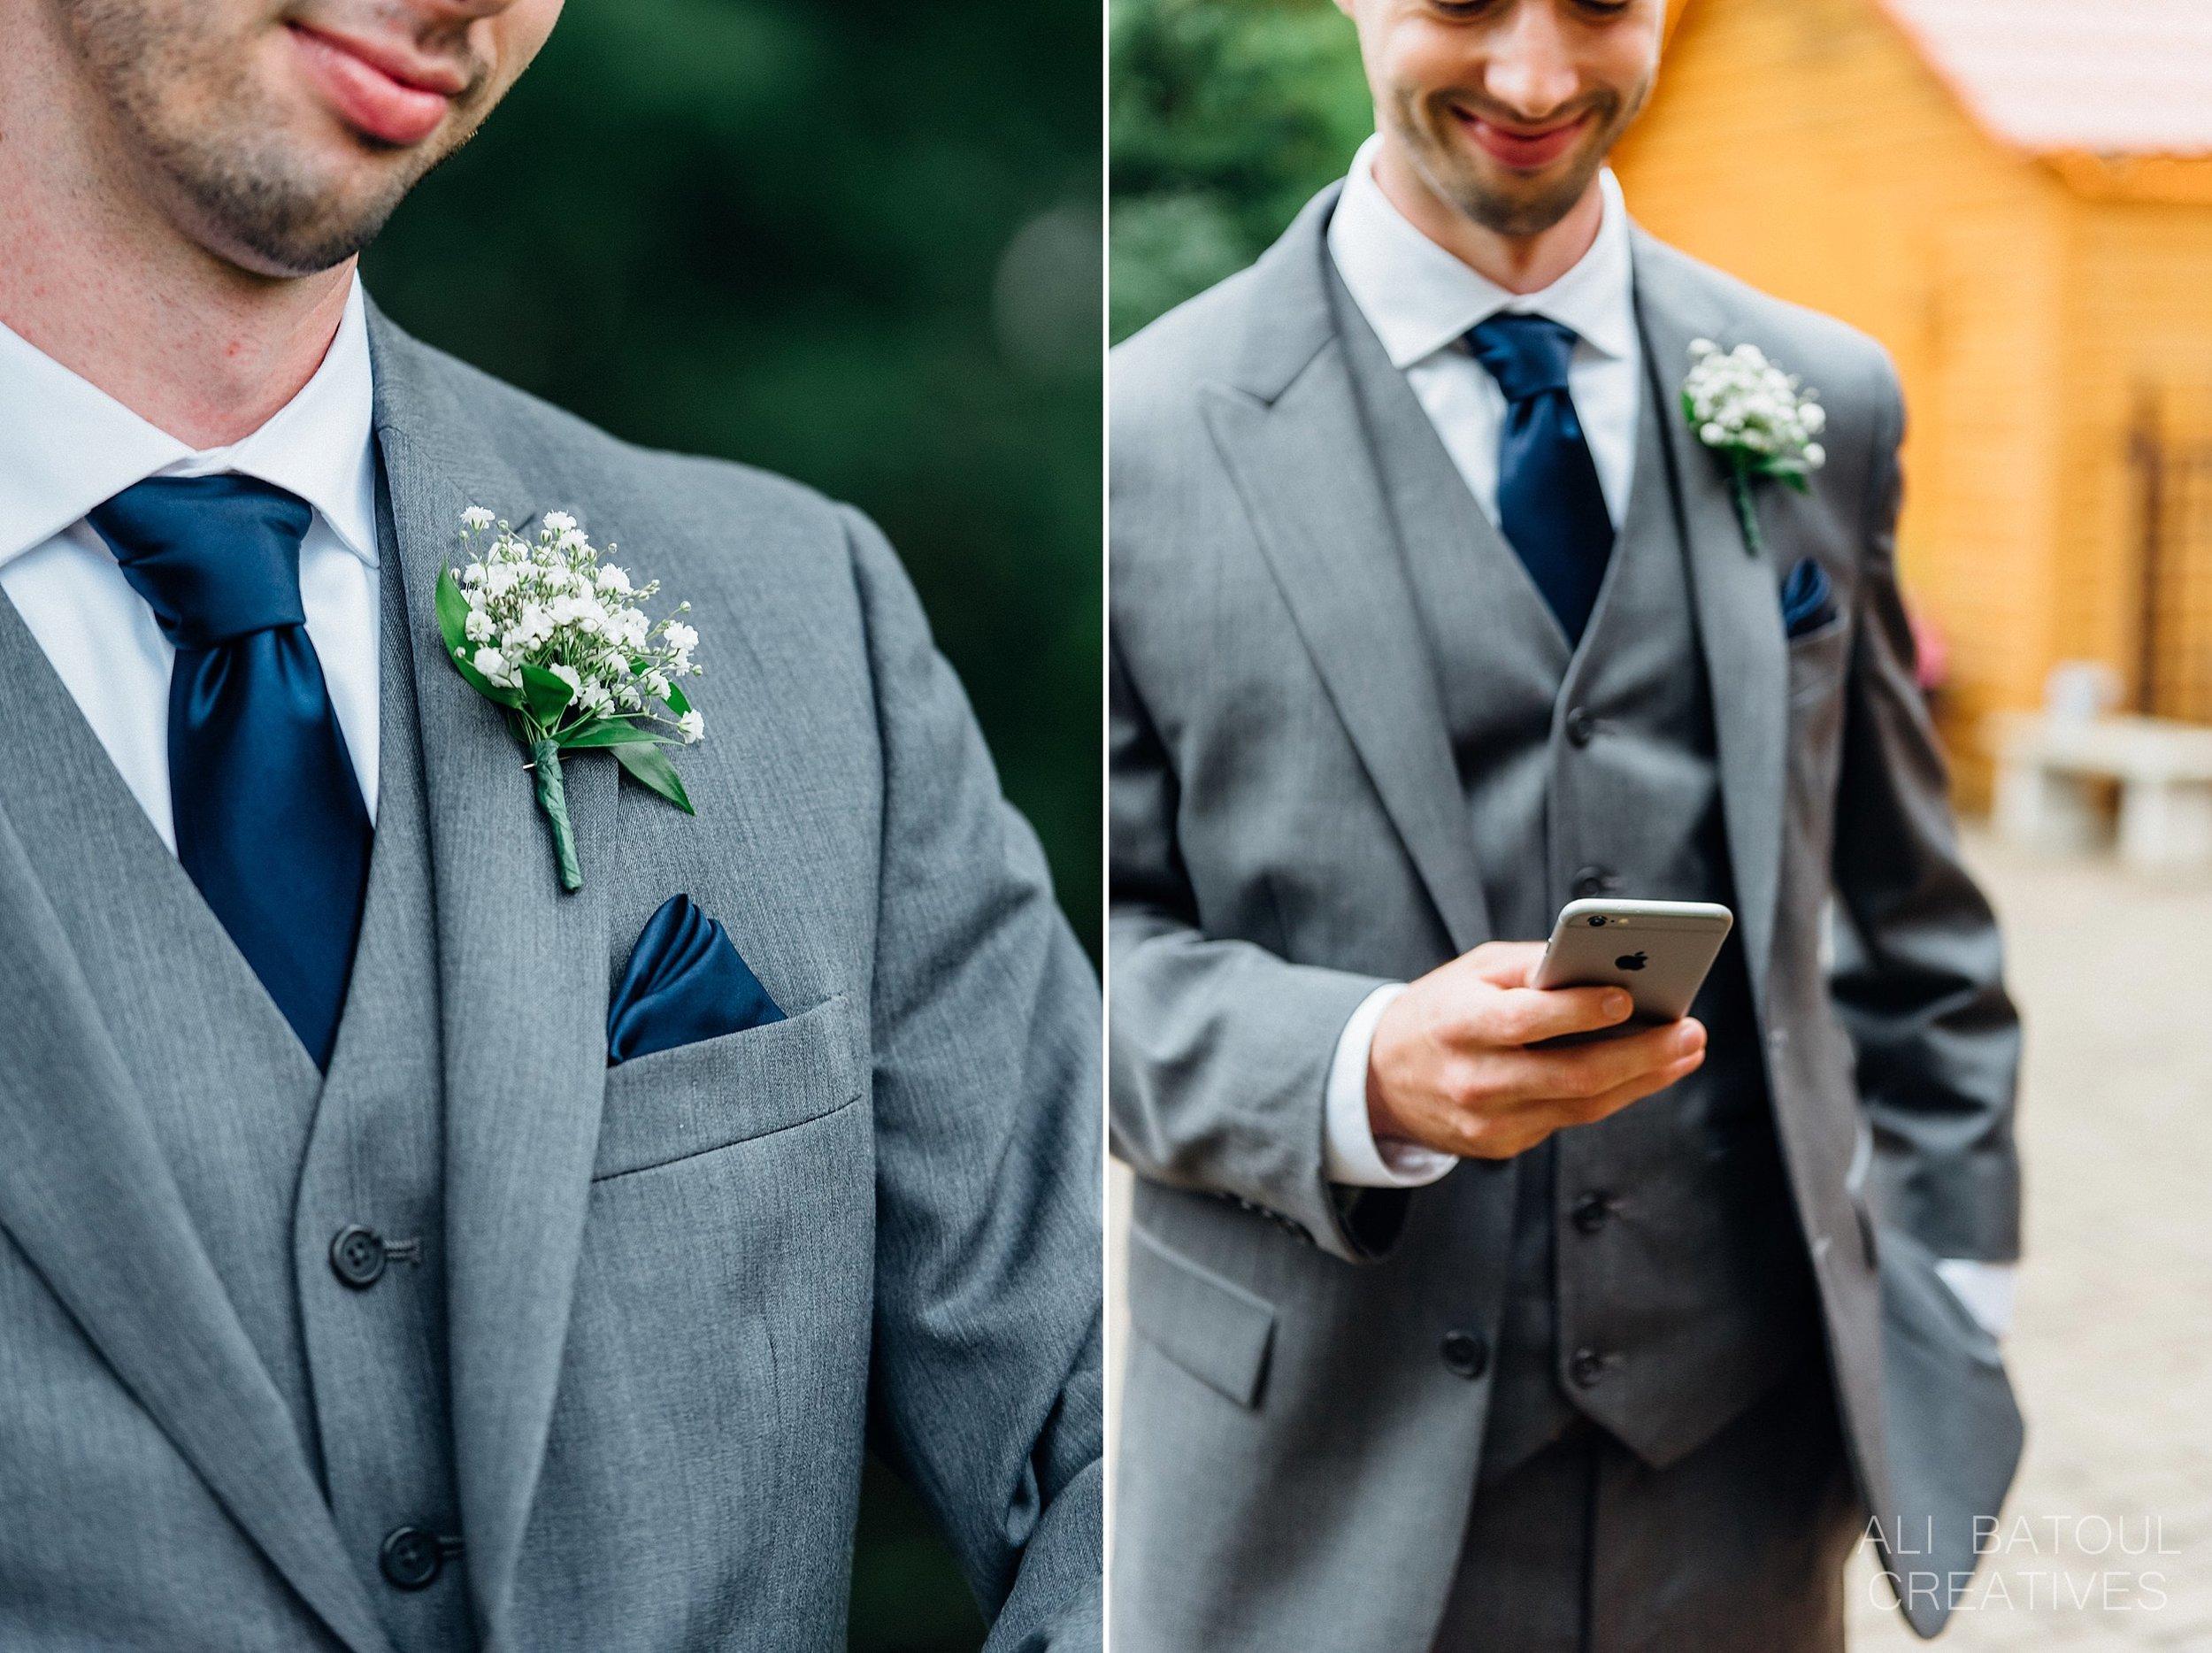 Jocelyn + Steve At The Schoolhouse Wedding - Ali and Batoul Fine Art Wedding Photography_0048.jpg